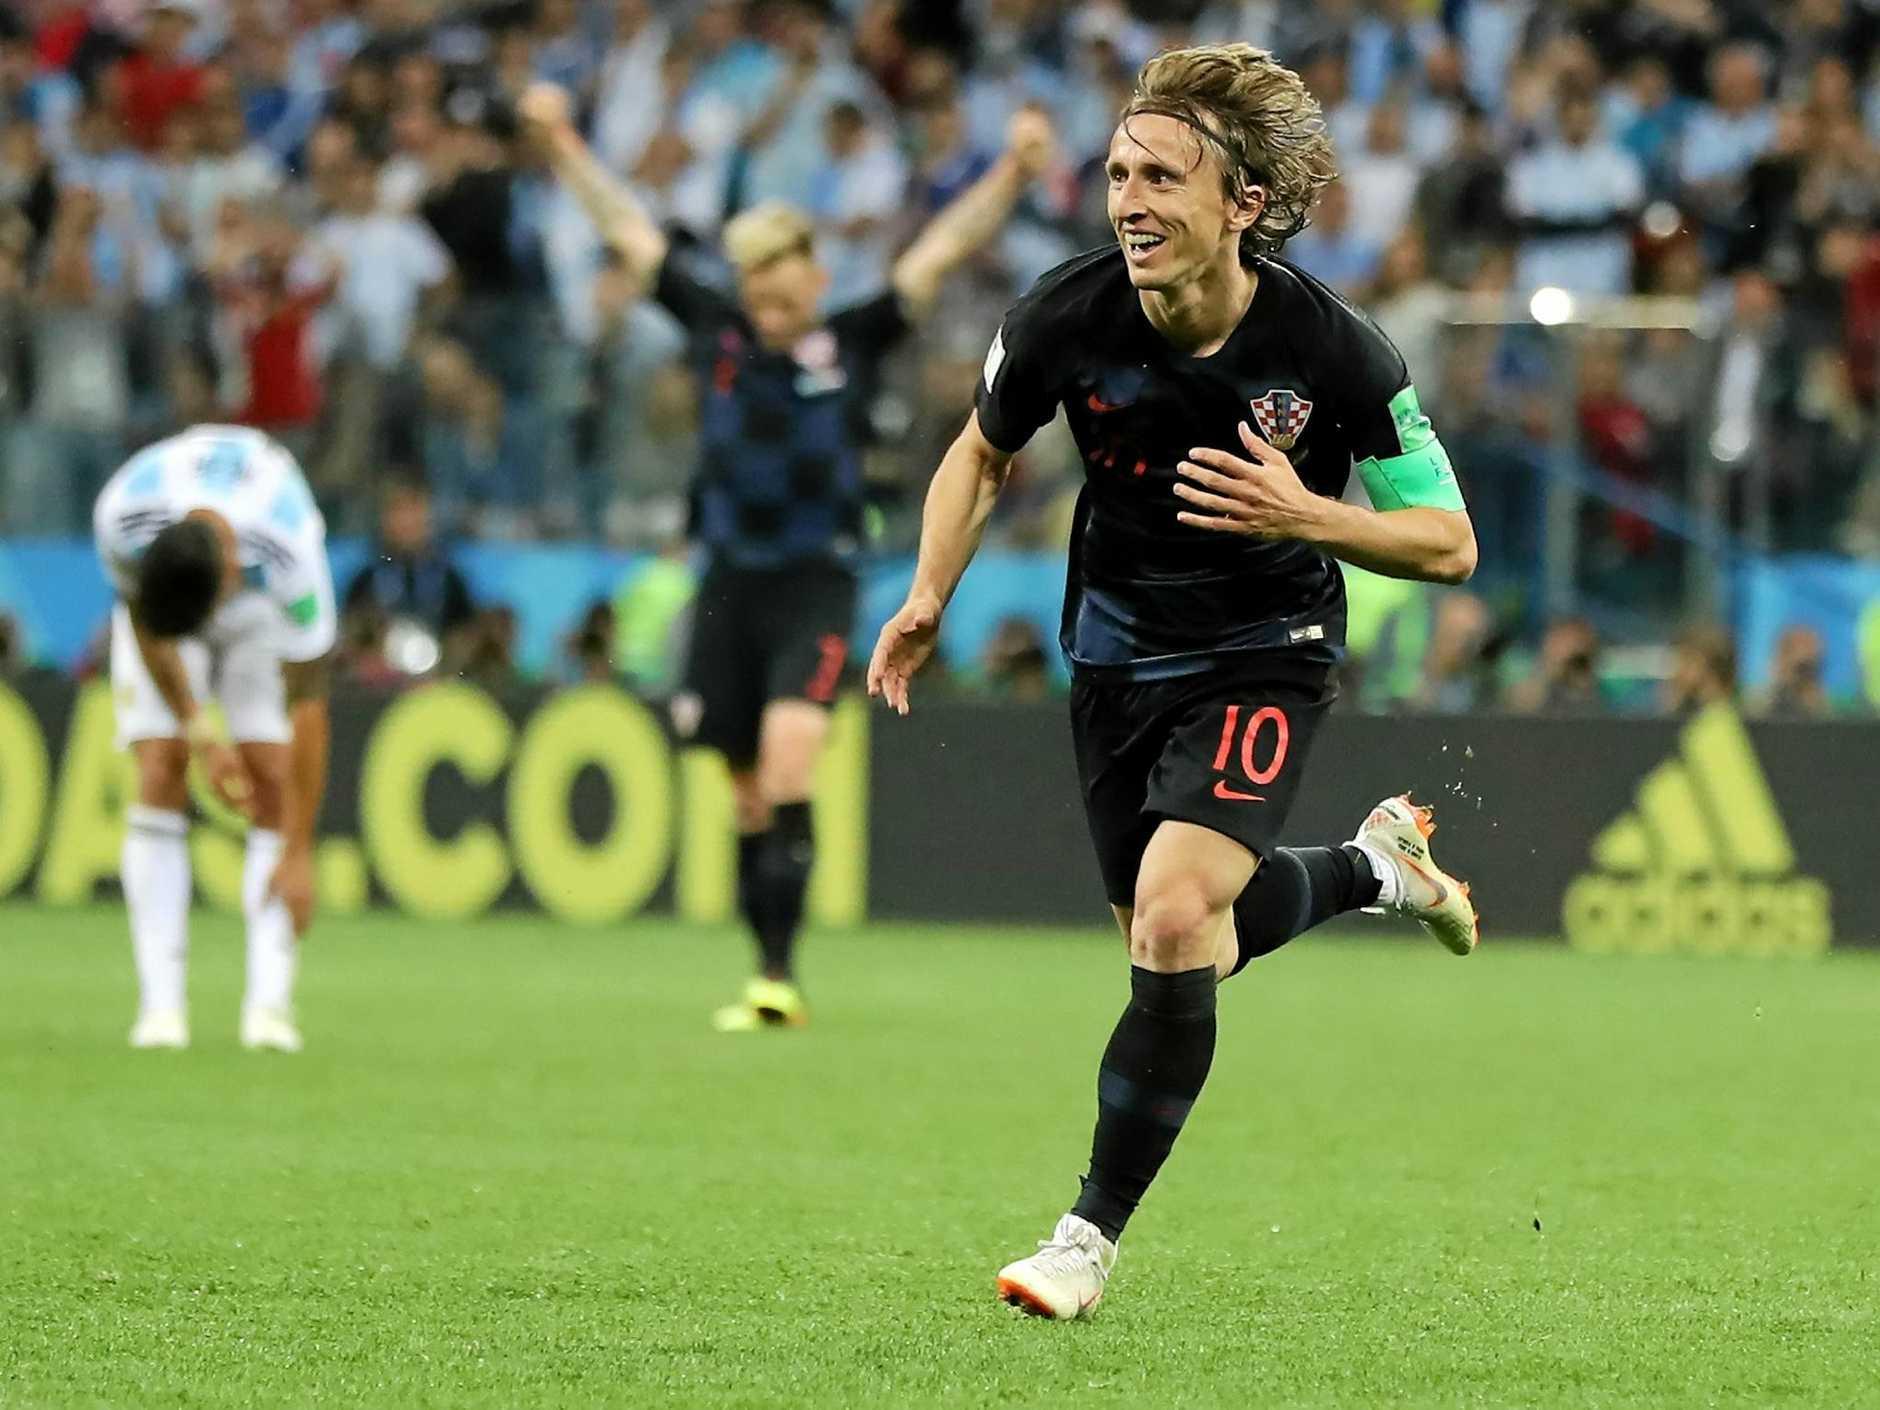 Why neutral fans should cheer for Croatia not France. Croatia's captain Luka Modric celebrates making Sunday's final.